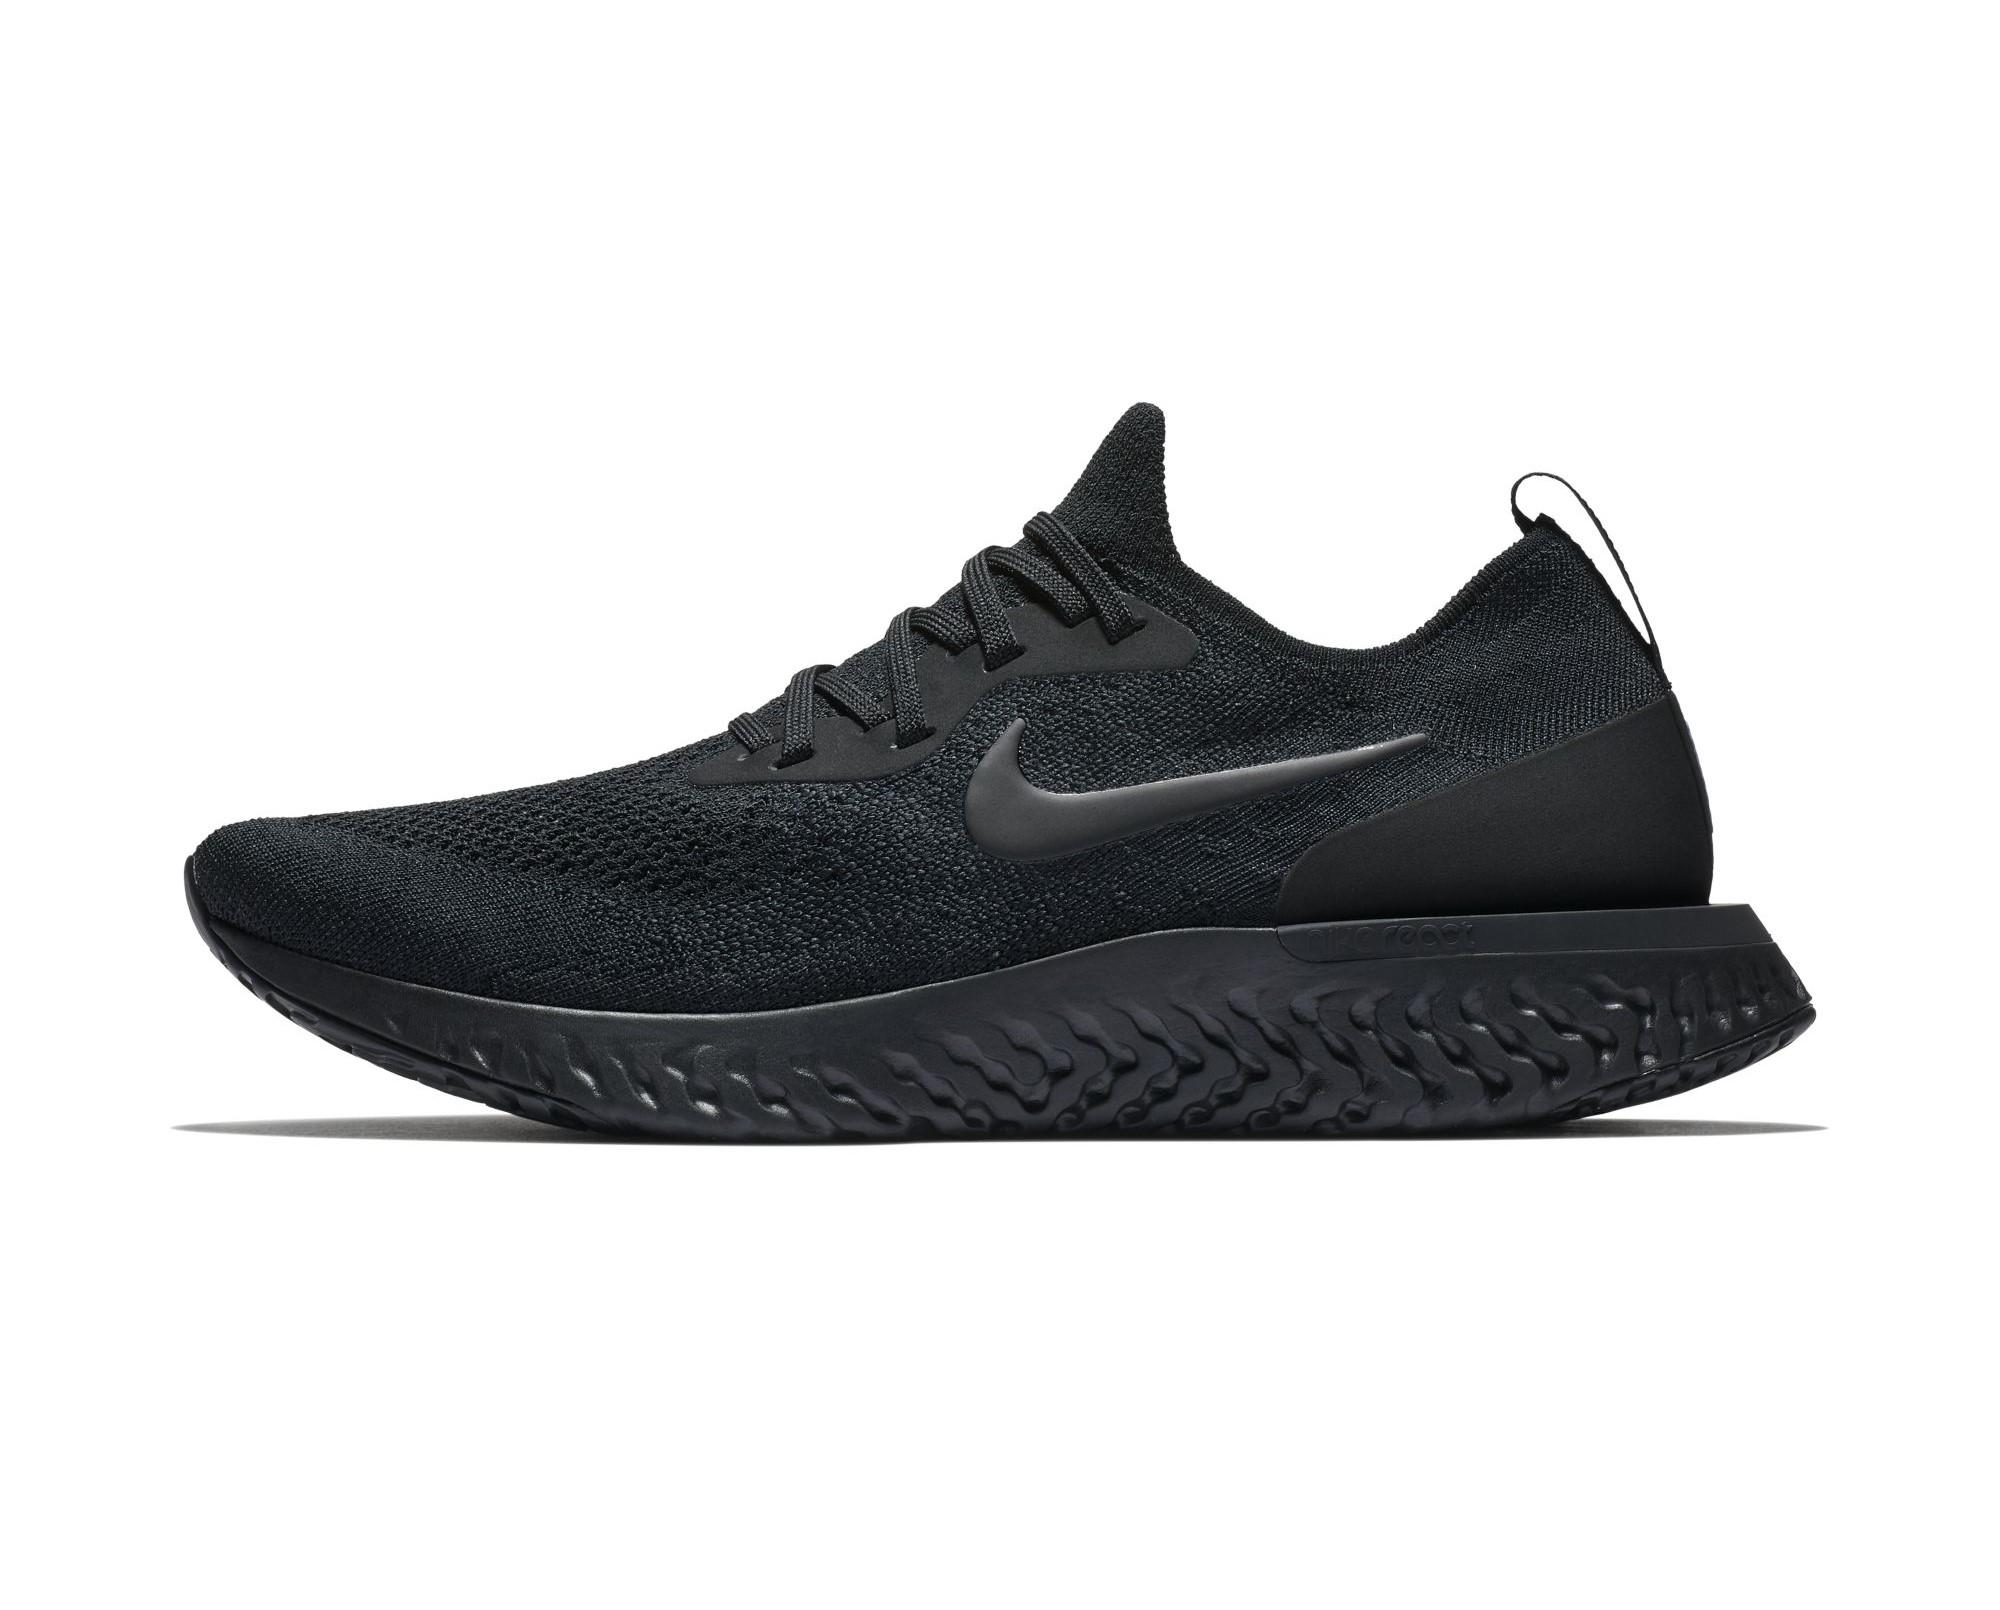 61ec6e0ff289 The Nike Epic React Flyknit  Triple Black  Has Dropped Overseas ...